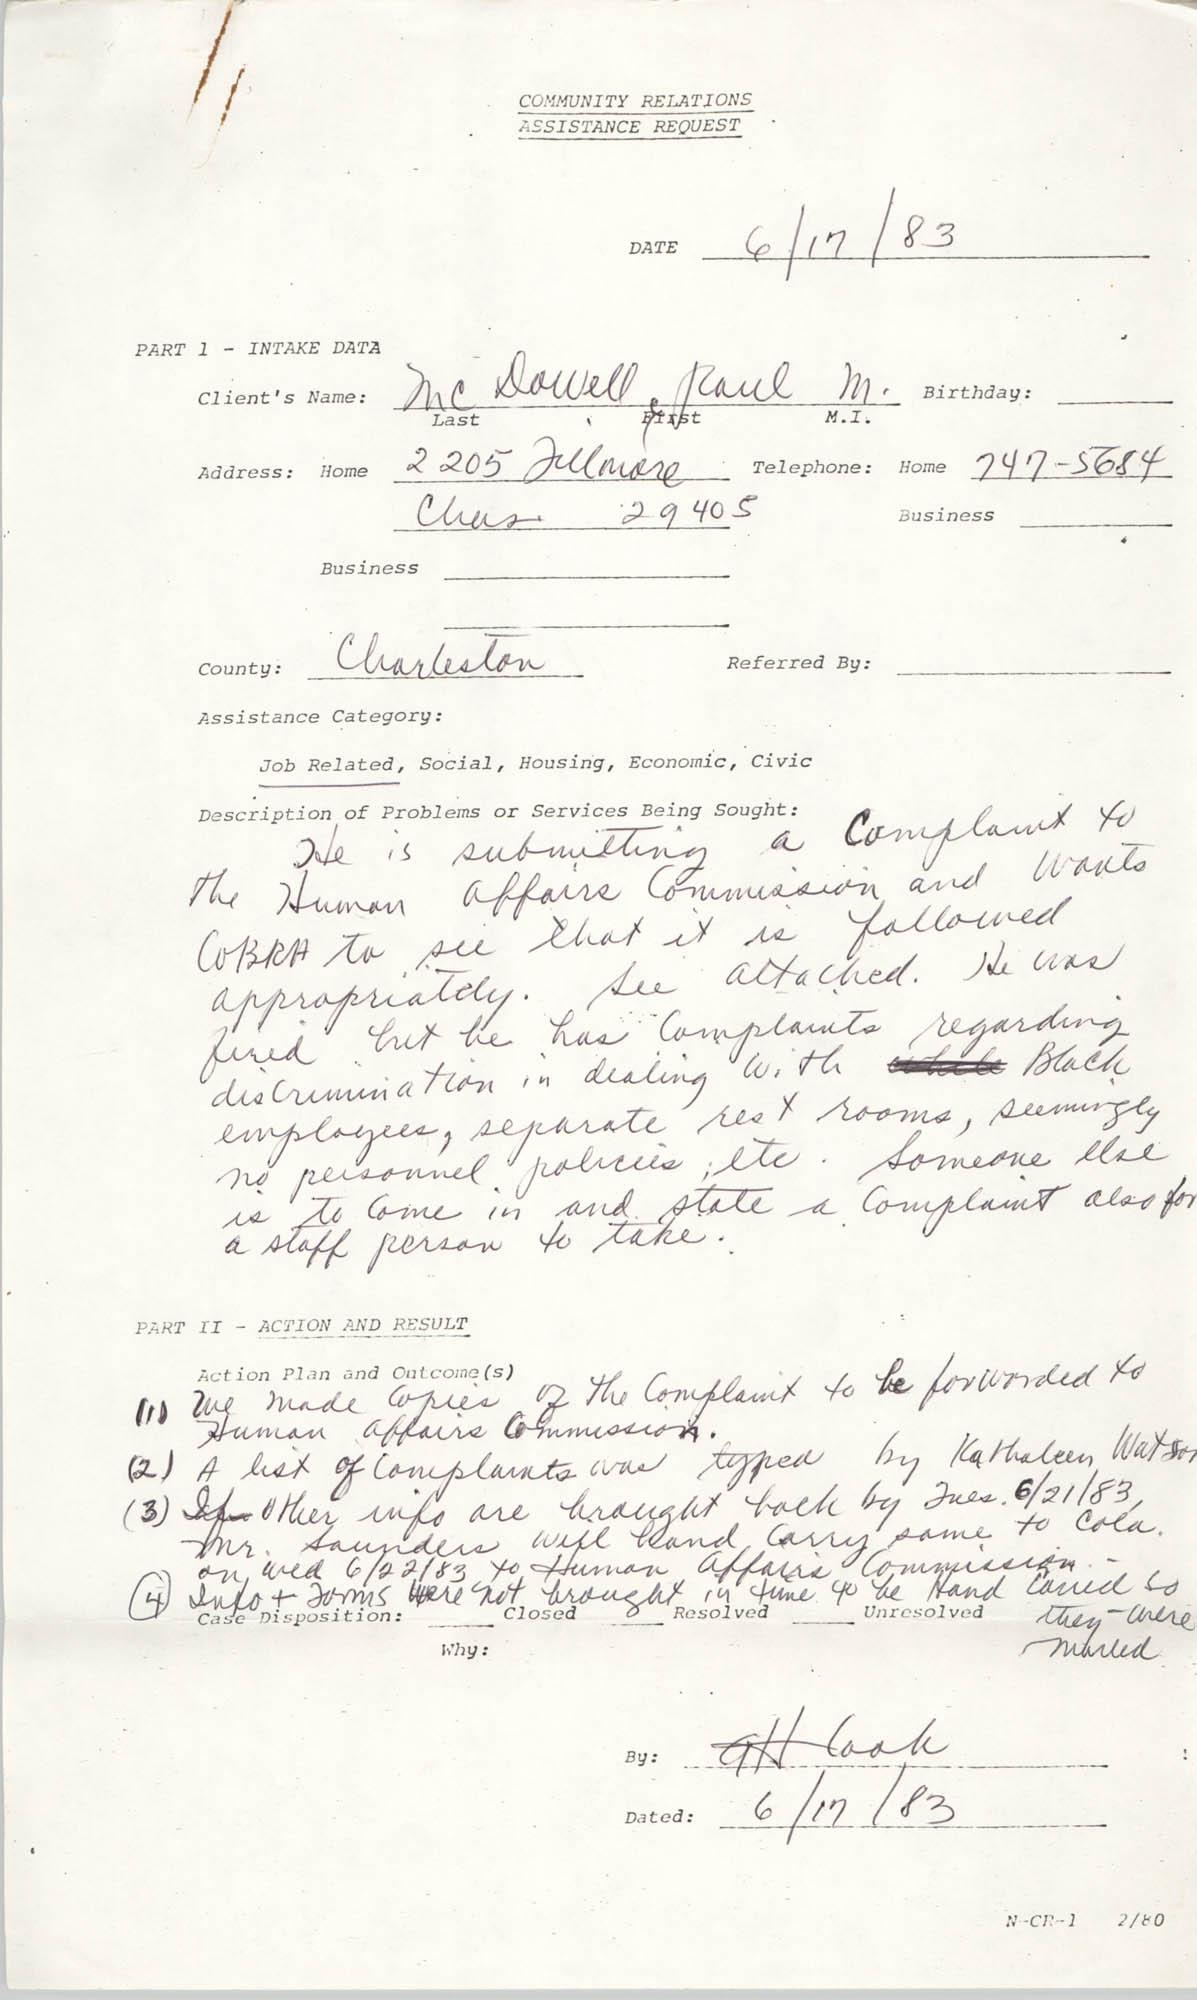 Community Relations Assistance Request, June 17, 1983